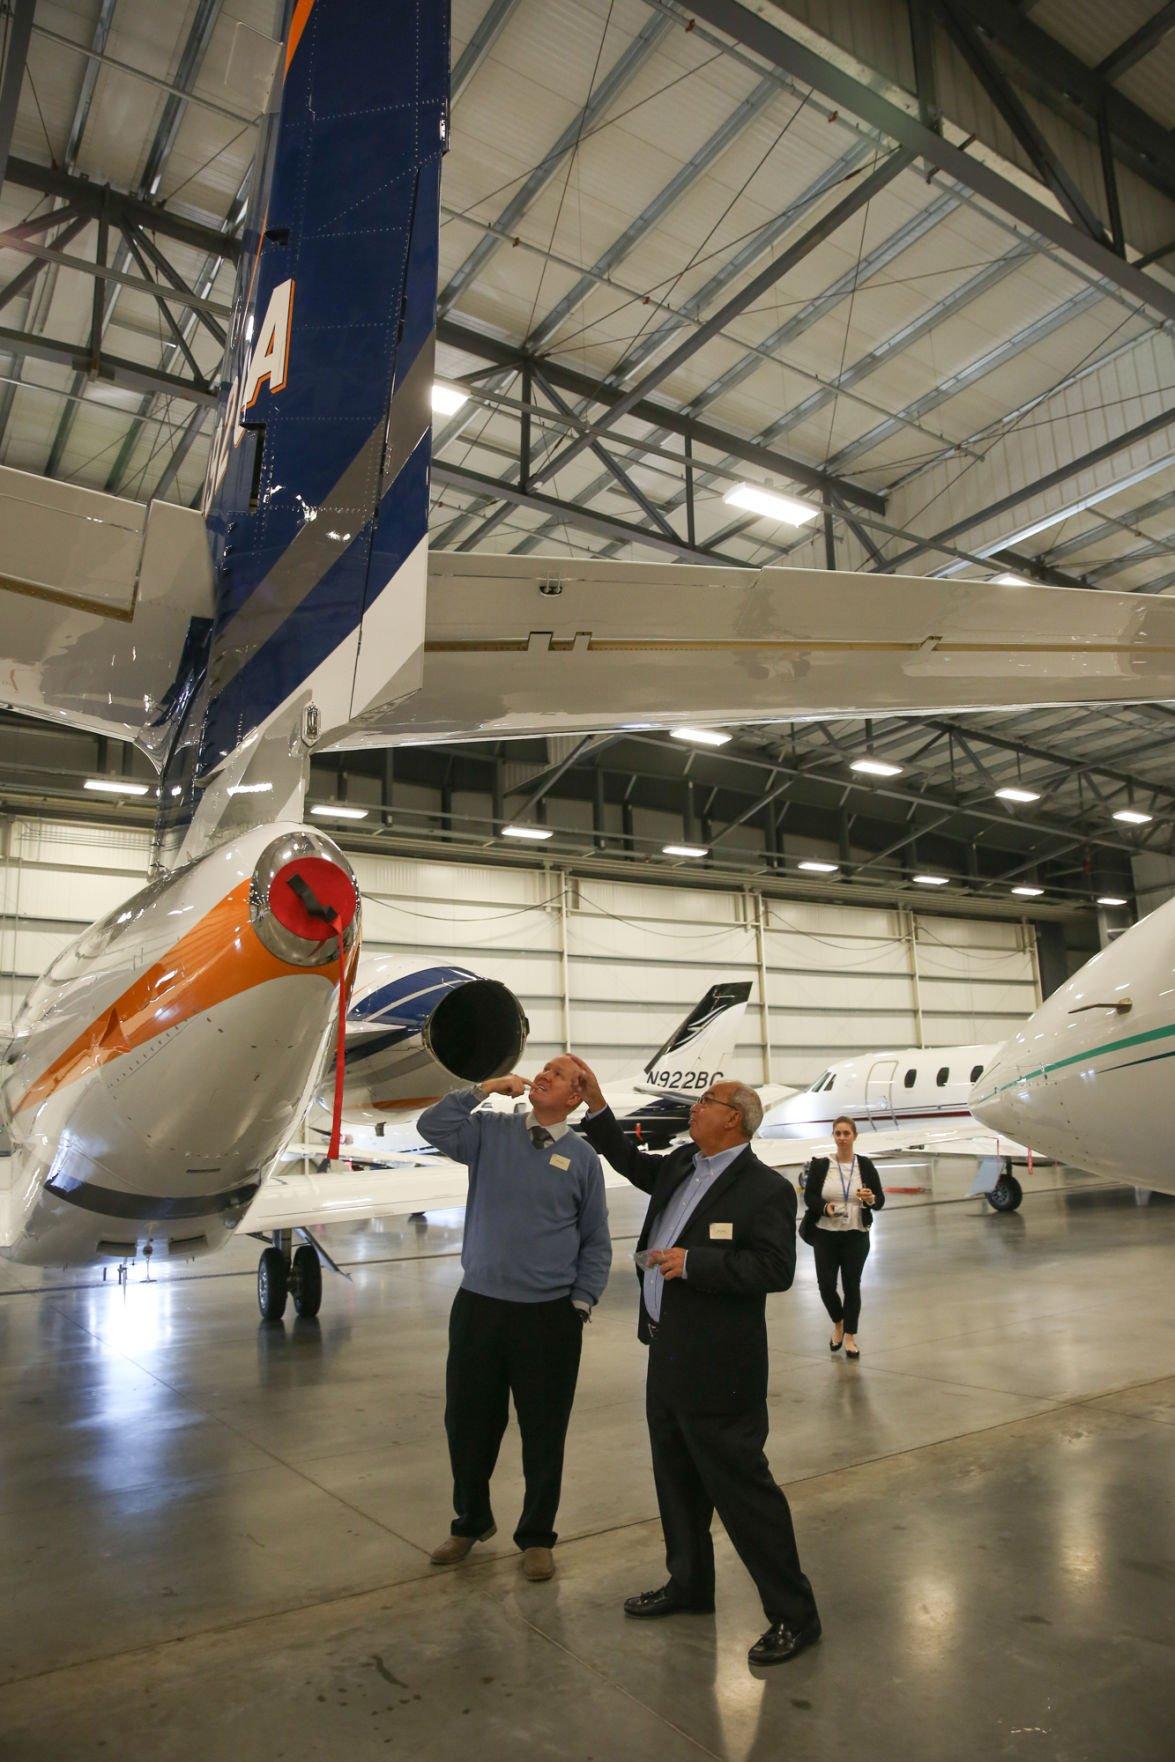 Gary Jet Center opens its new terminal